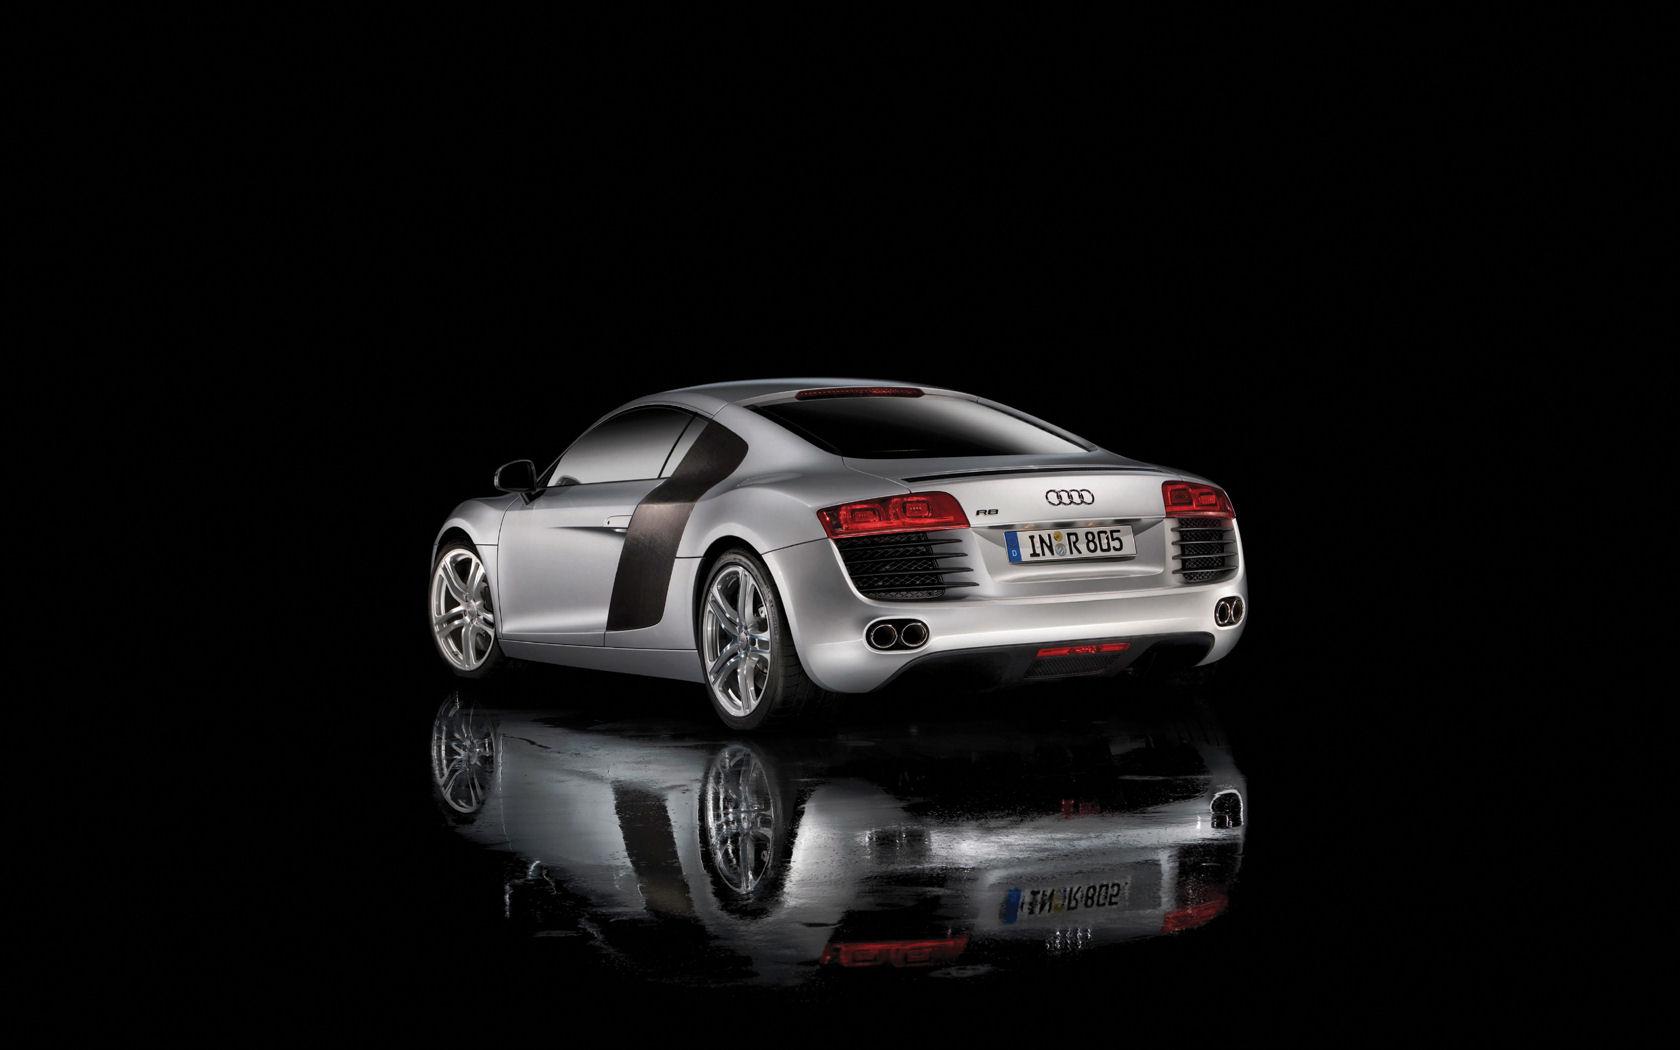 Audi R8 V8 V10 Quattro R Tronic Free Widescreen Wallpaper